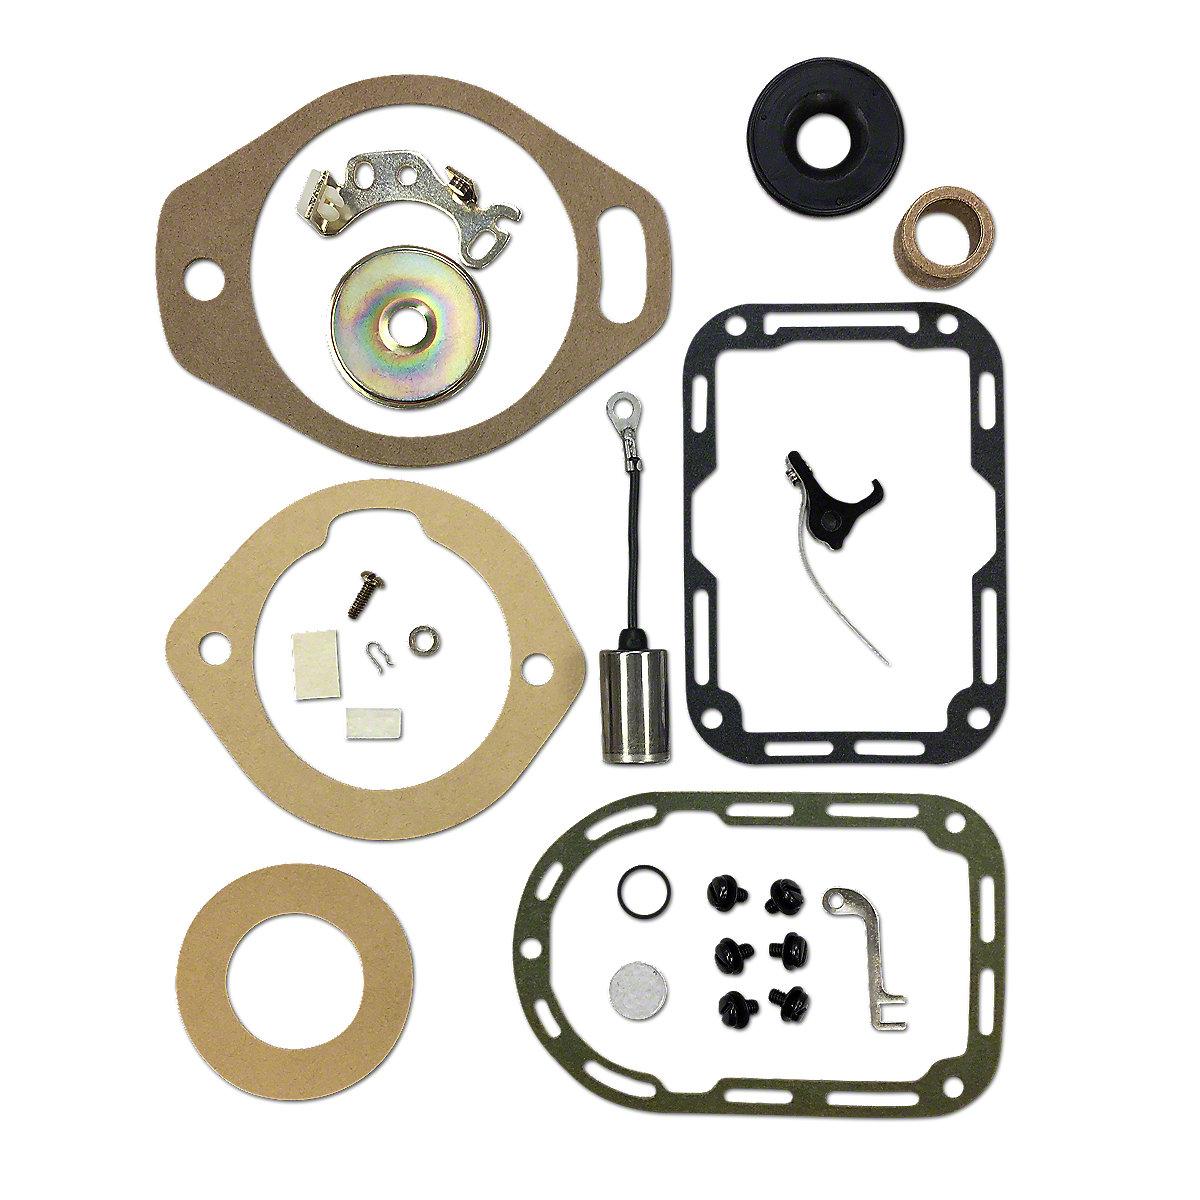 ABC3723WICO Magneto Basic Repair Kit